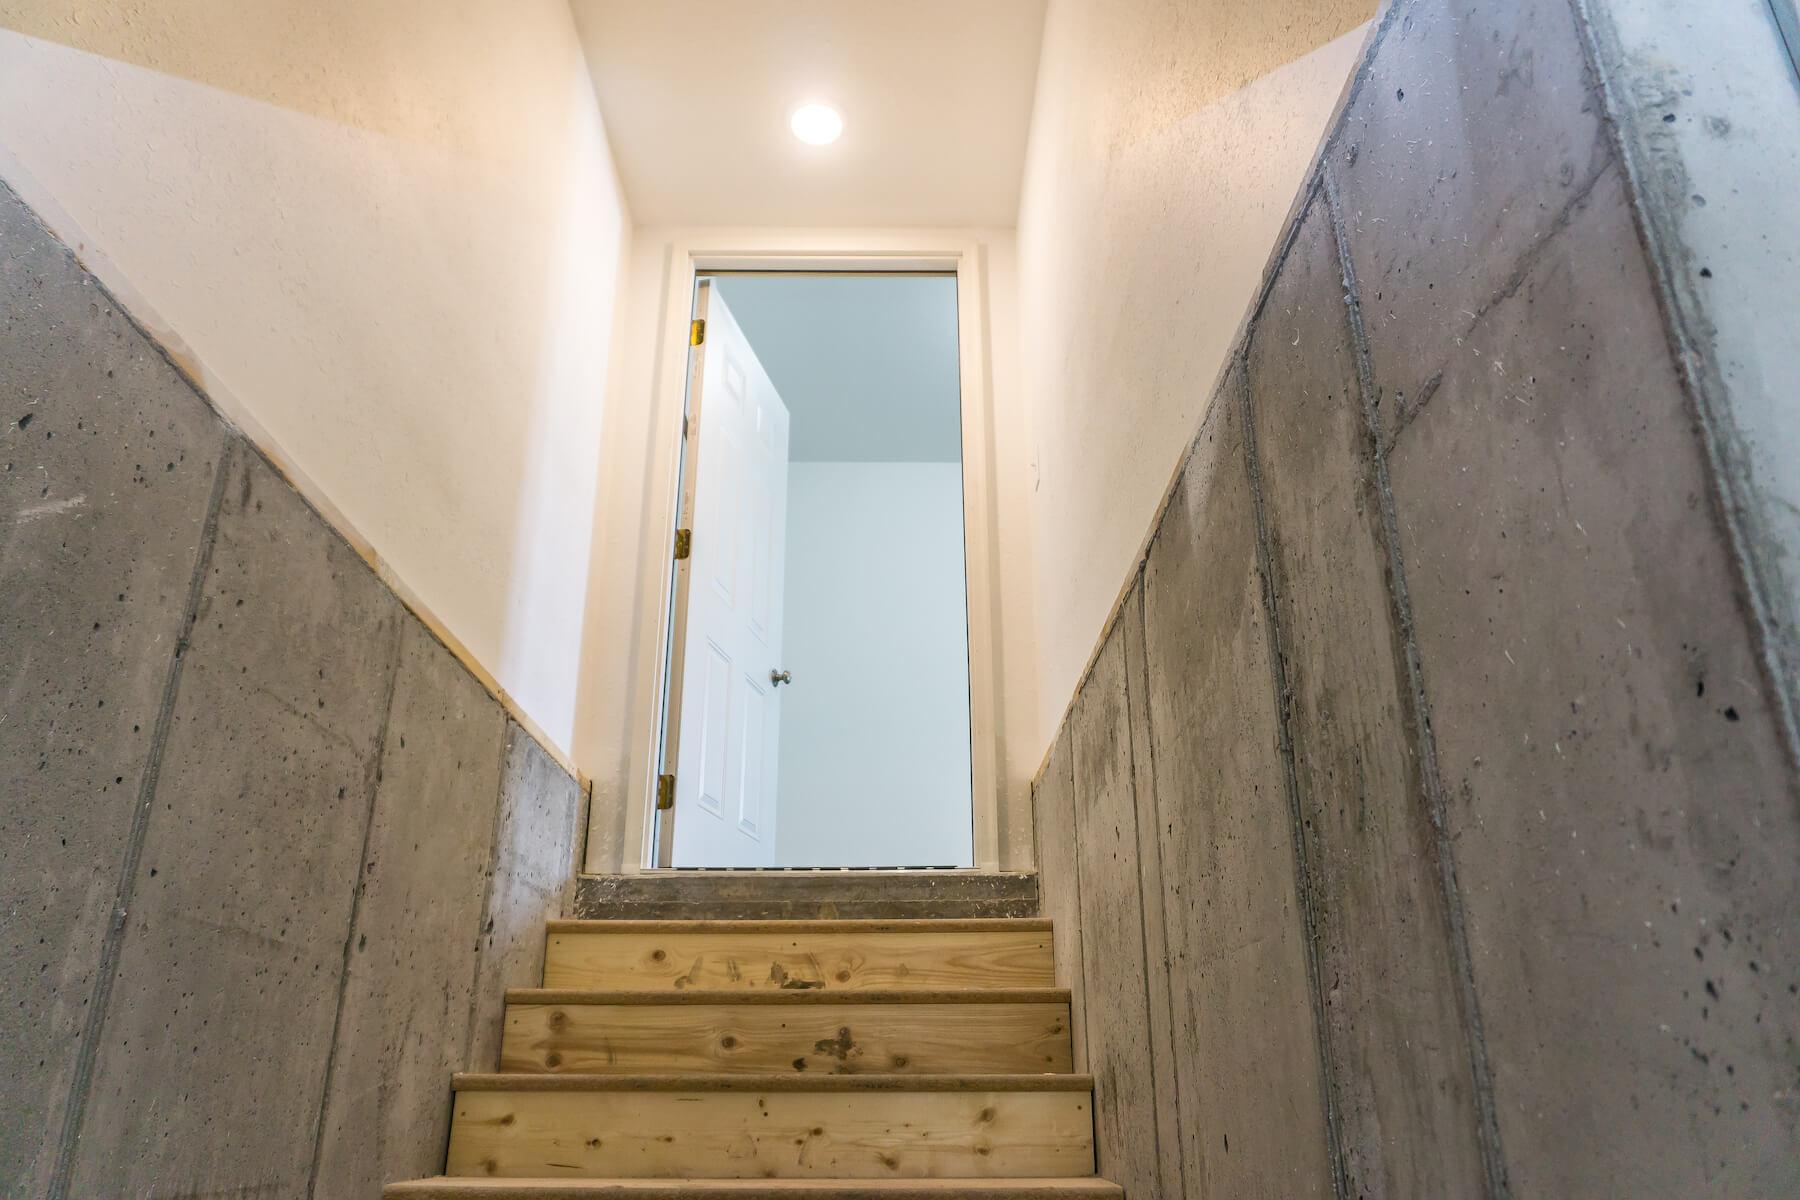 2019-4-12 Kemper Avenue Builders FirstSource Compressed  37.jpg